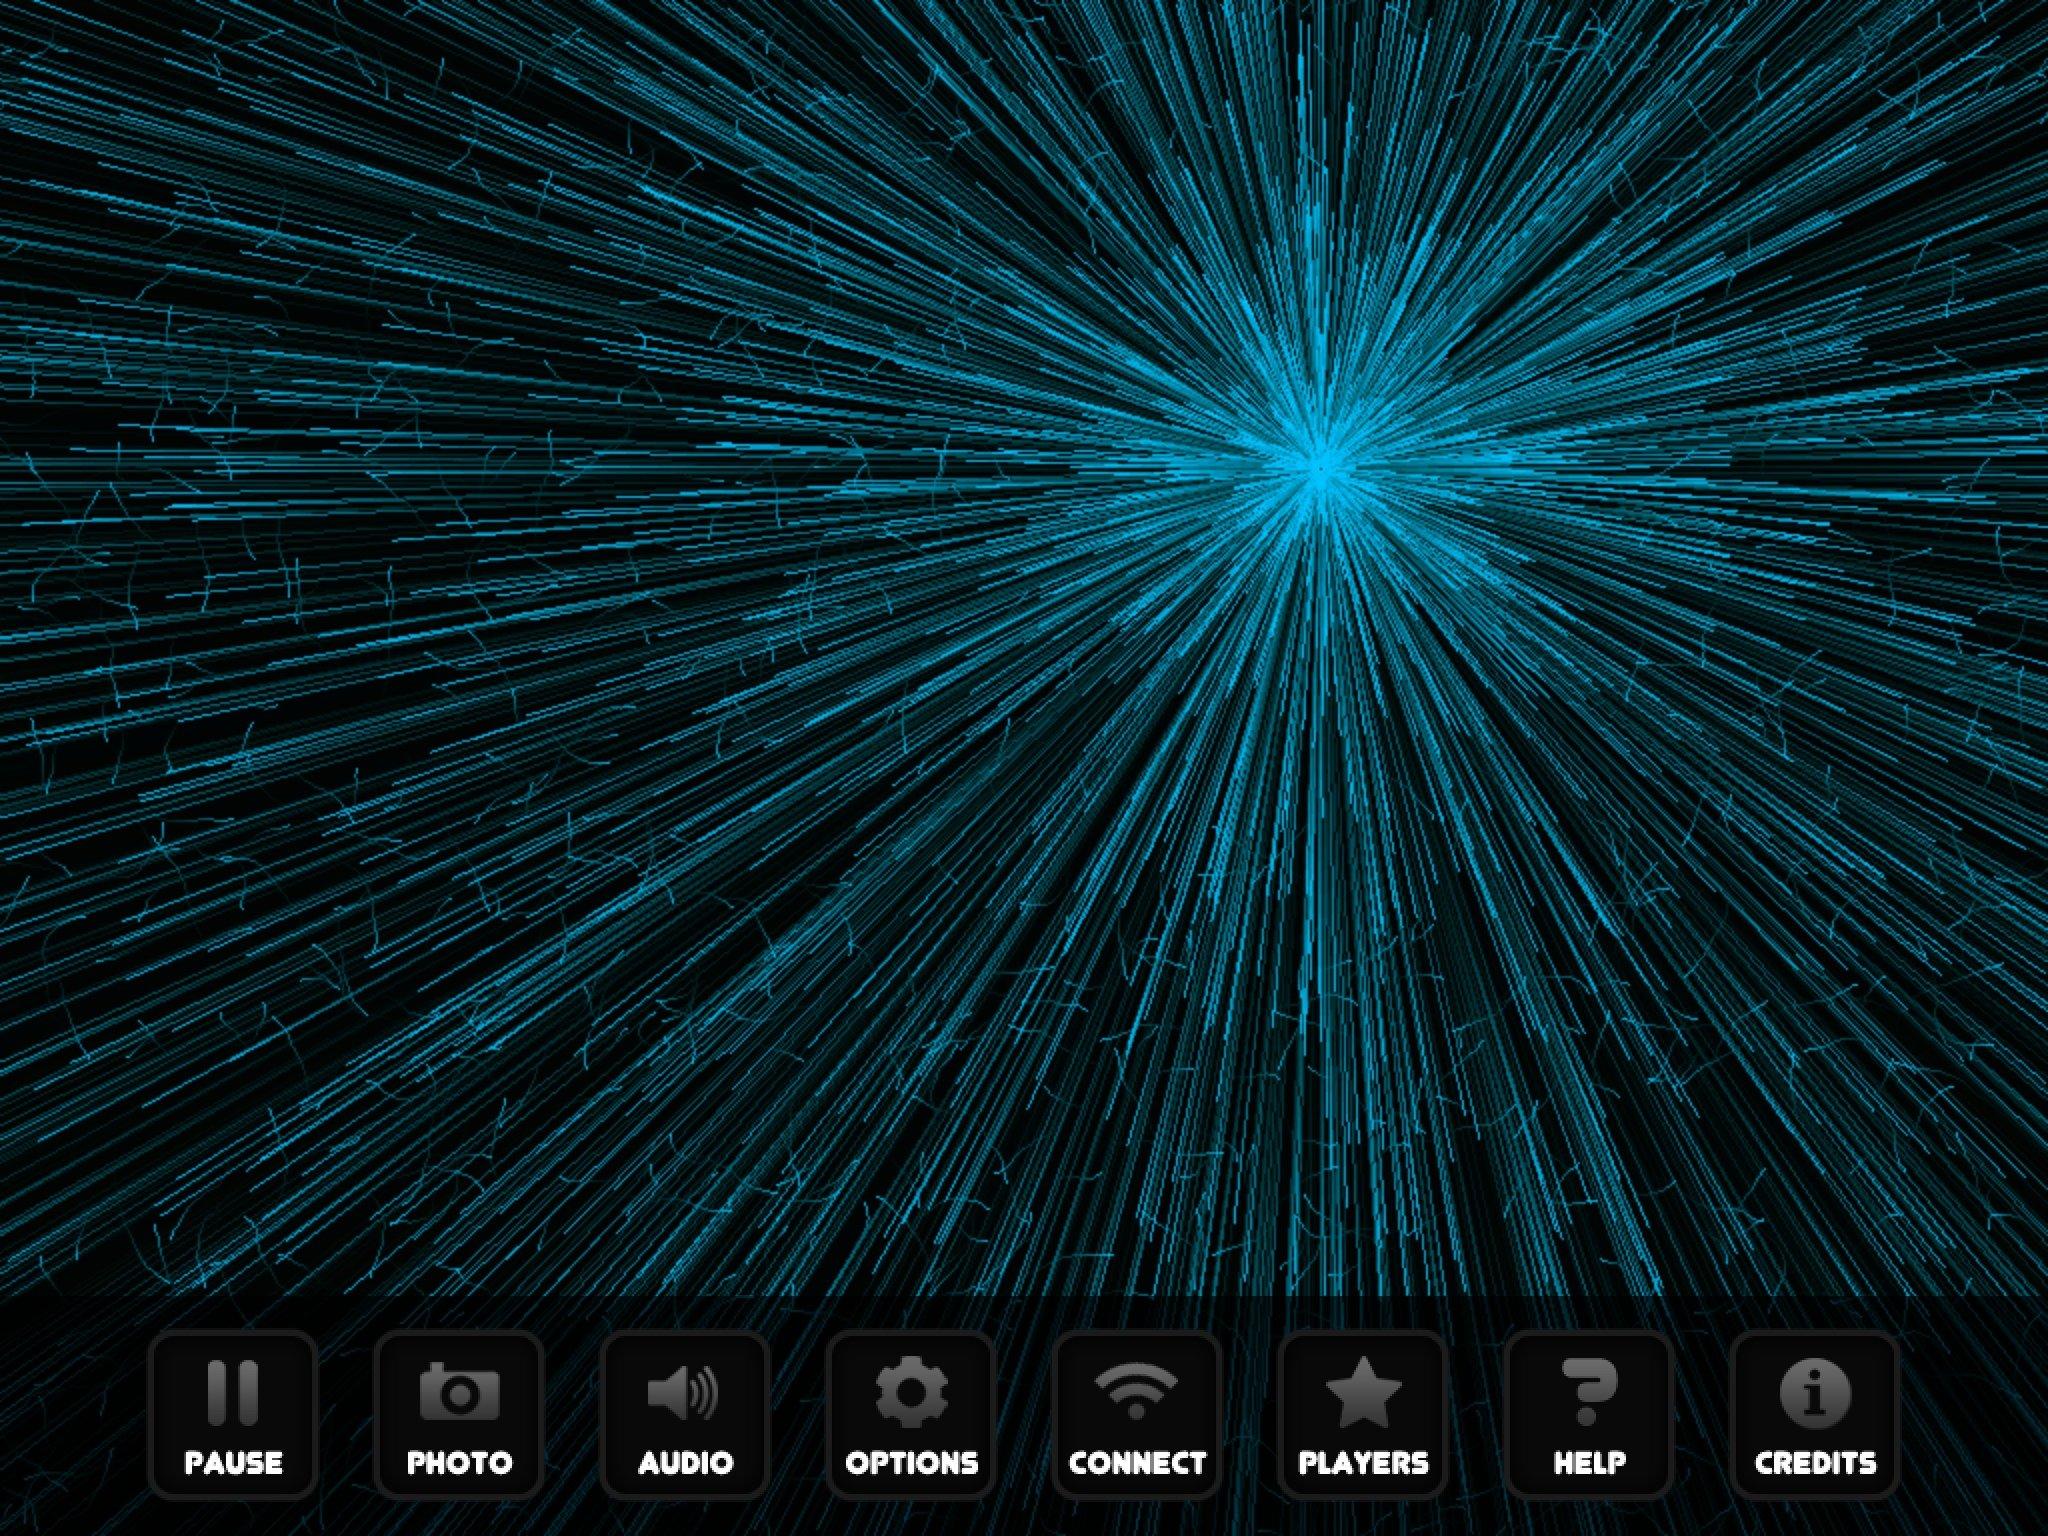 Physics Wallpaper Background Hd